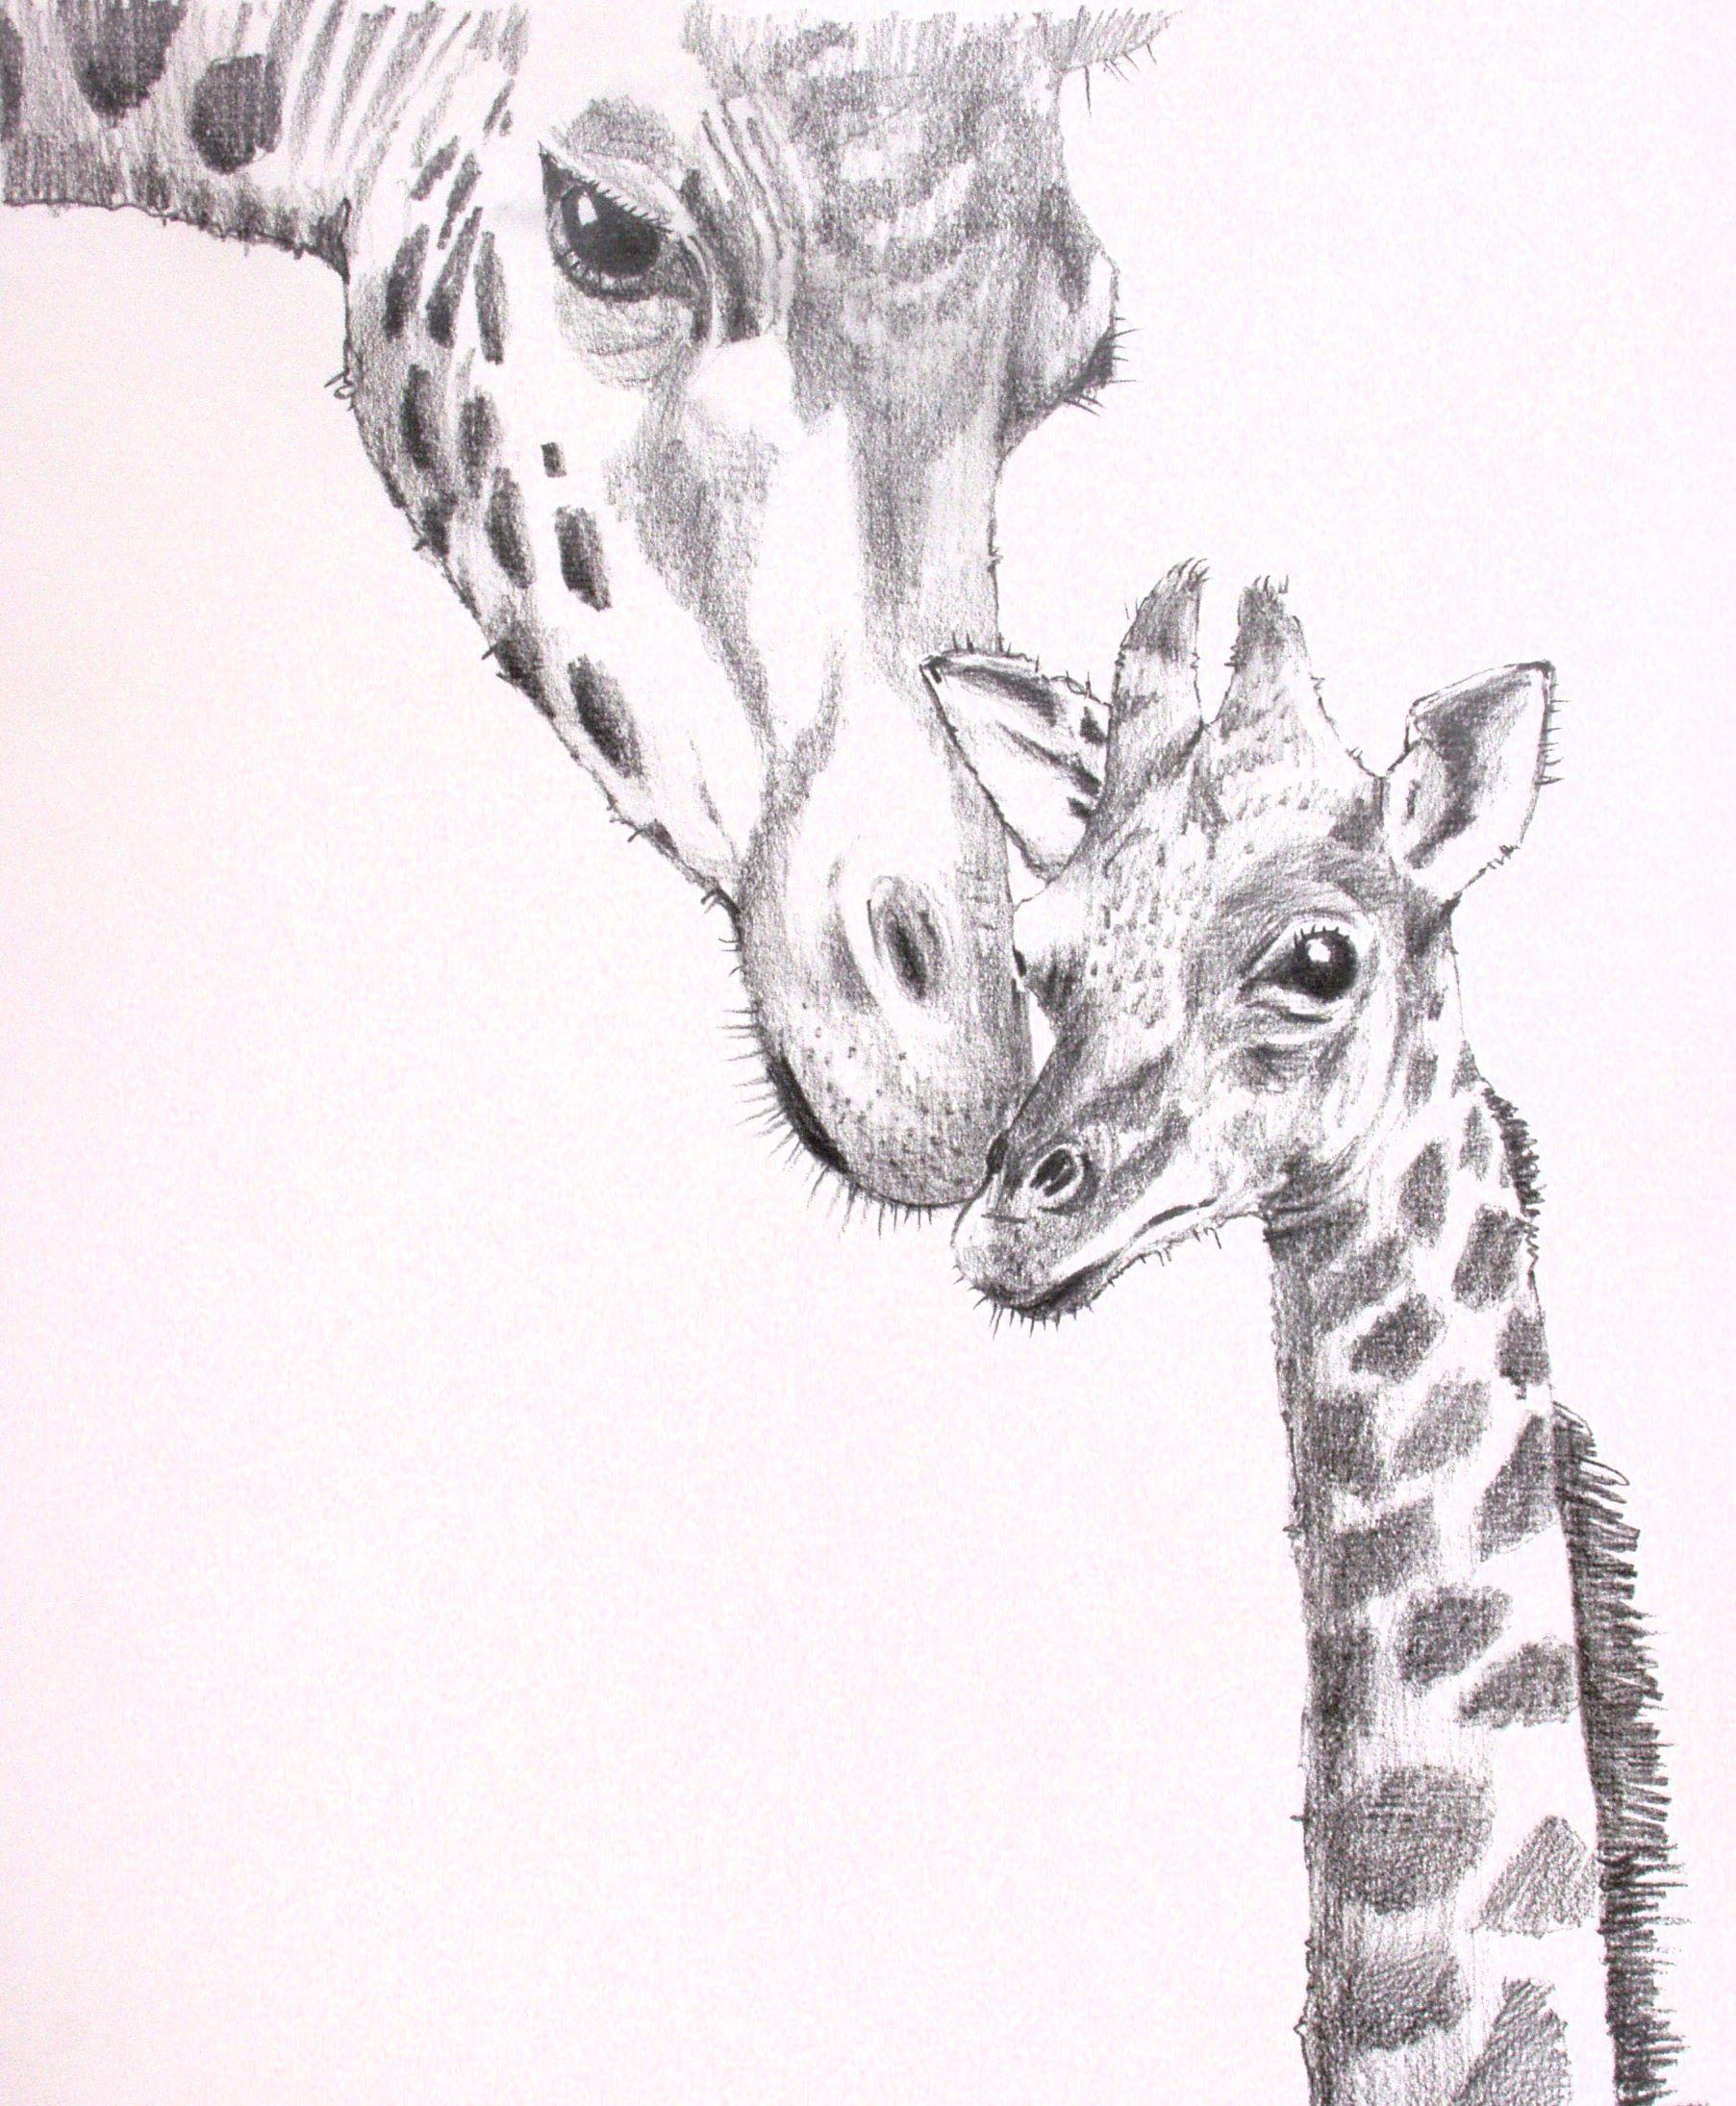 Pics For Gt Giraffe Face Pencil Drawing